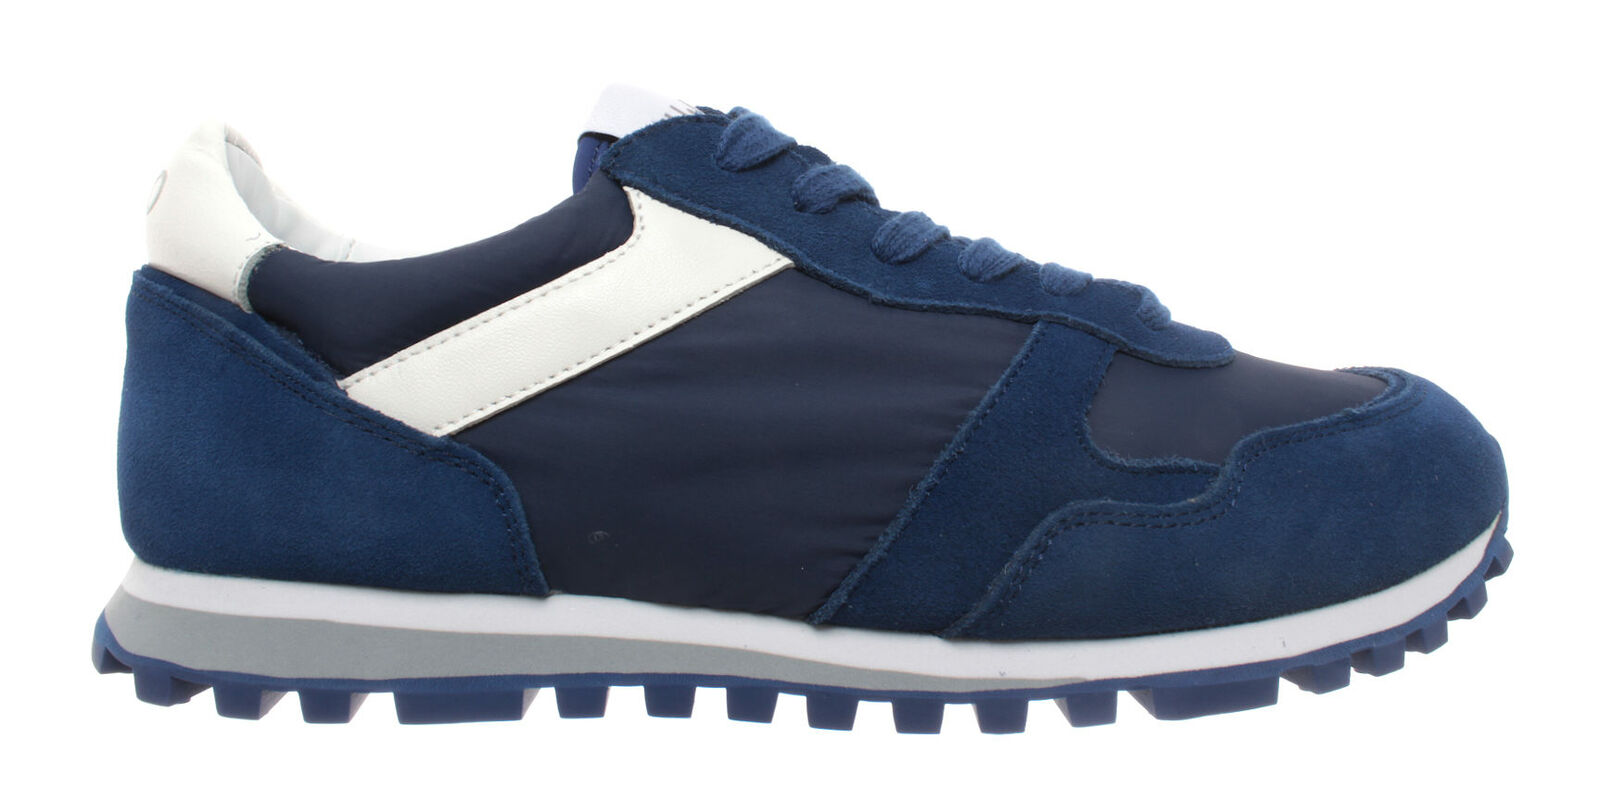 Herren Schuhe Turnschuhe LIU JO Milano Alex Running Blau Marine Blau Neu